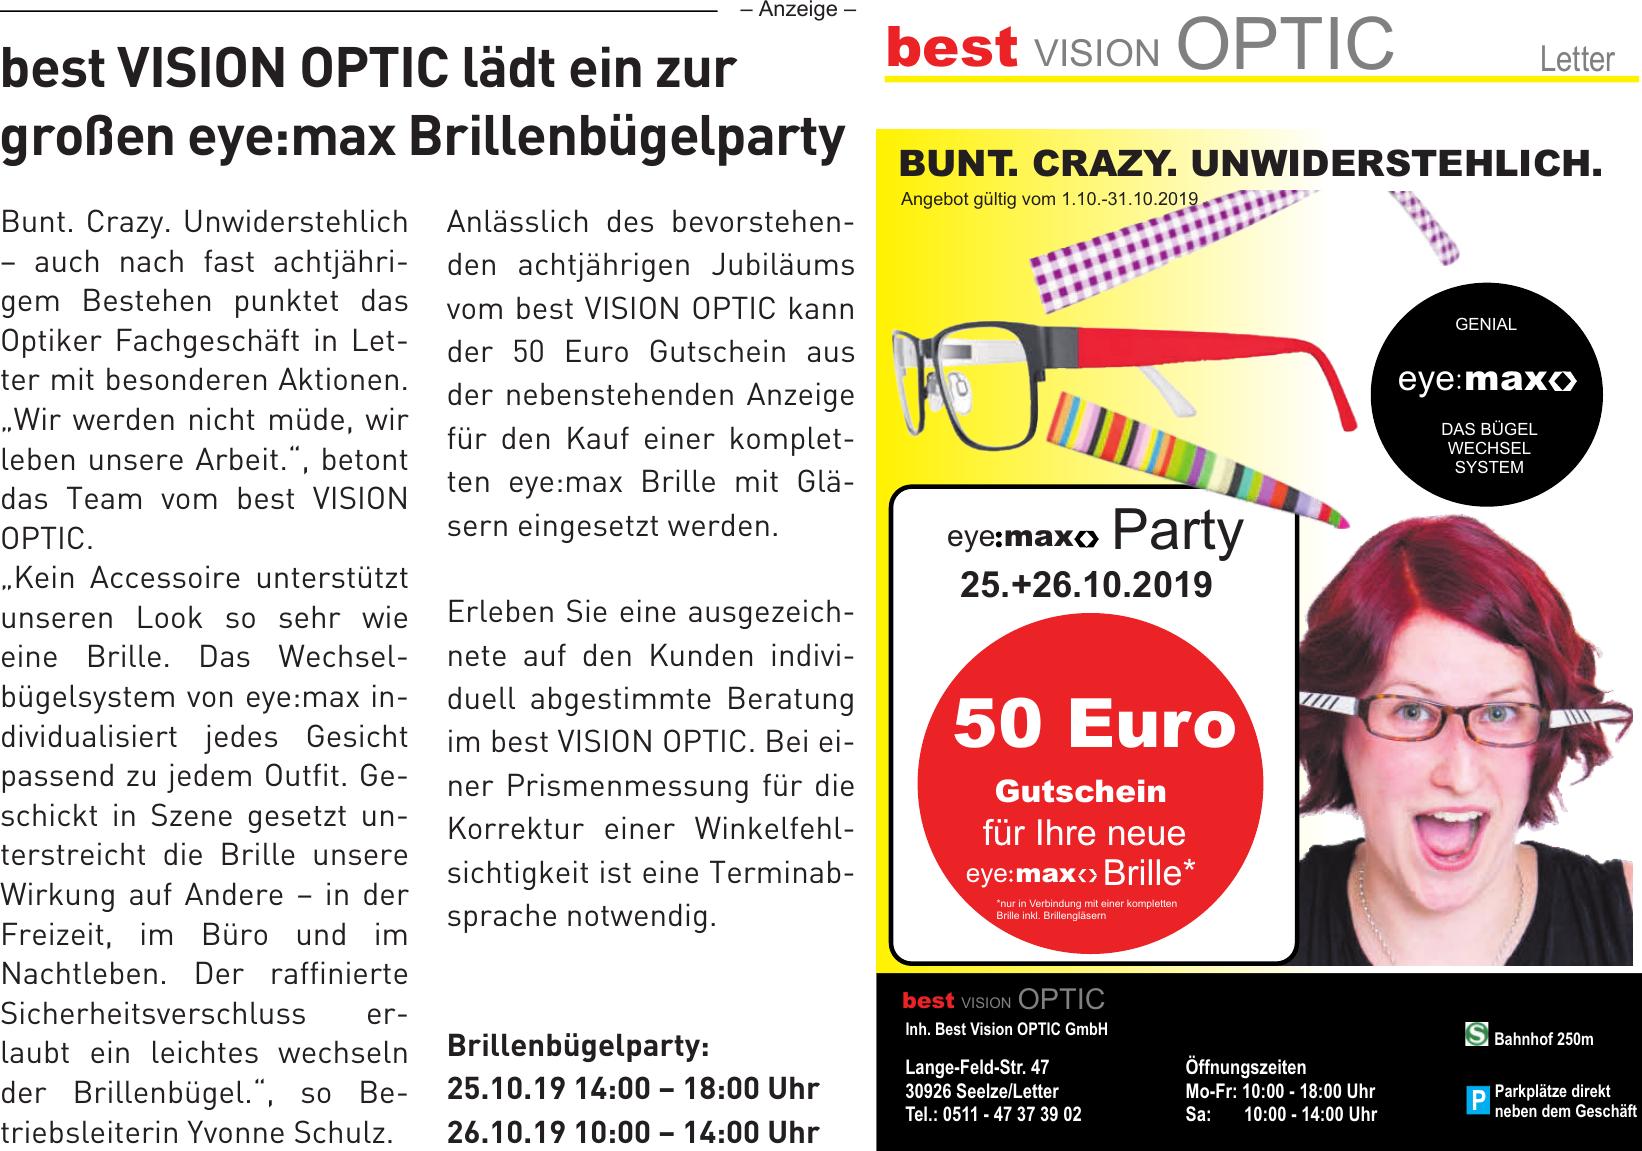 Best Vision OPTIC GmbH